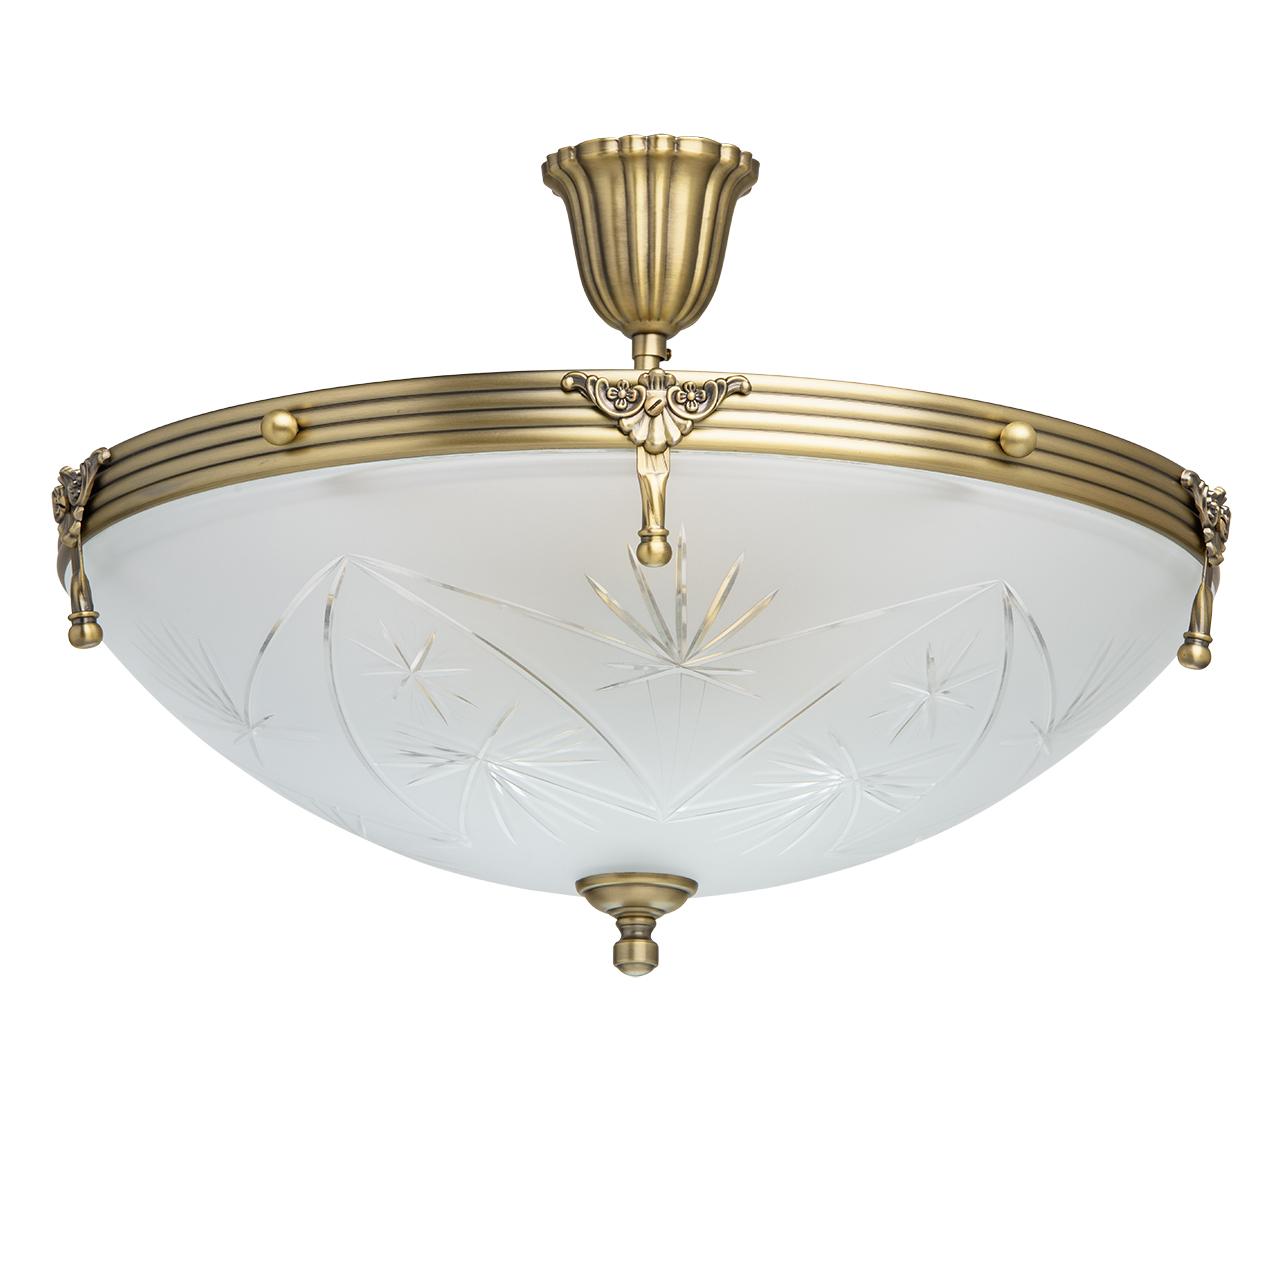 Lampa sufitowa art deco mw light classic sklep for Classic art deco